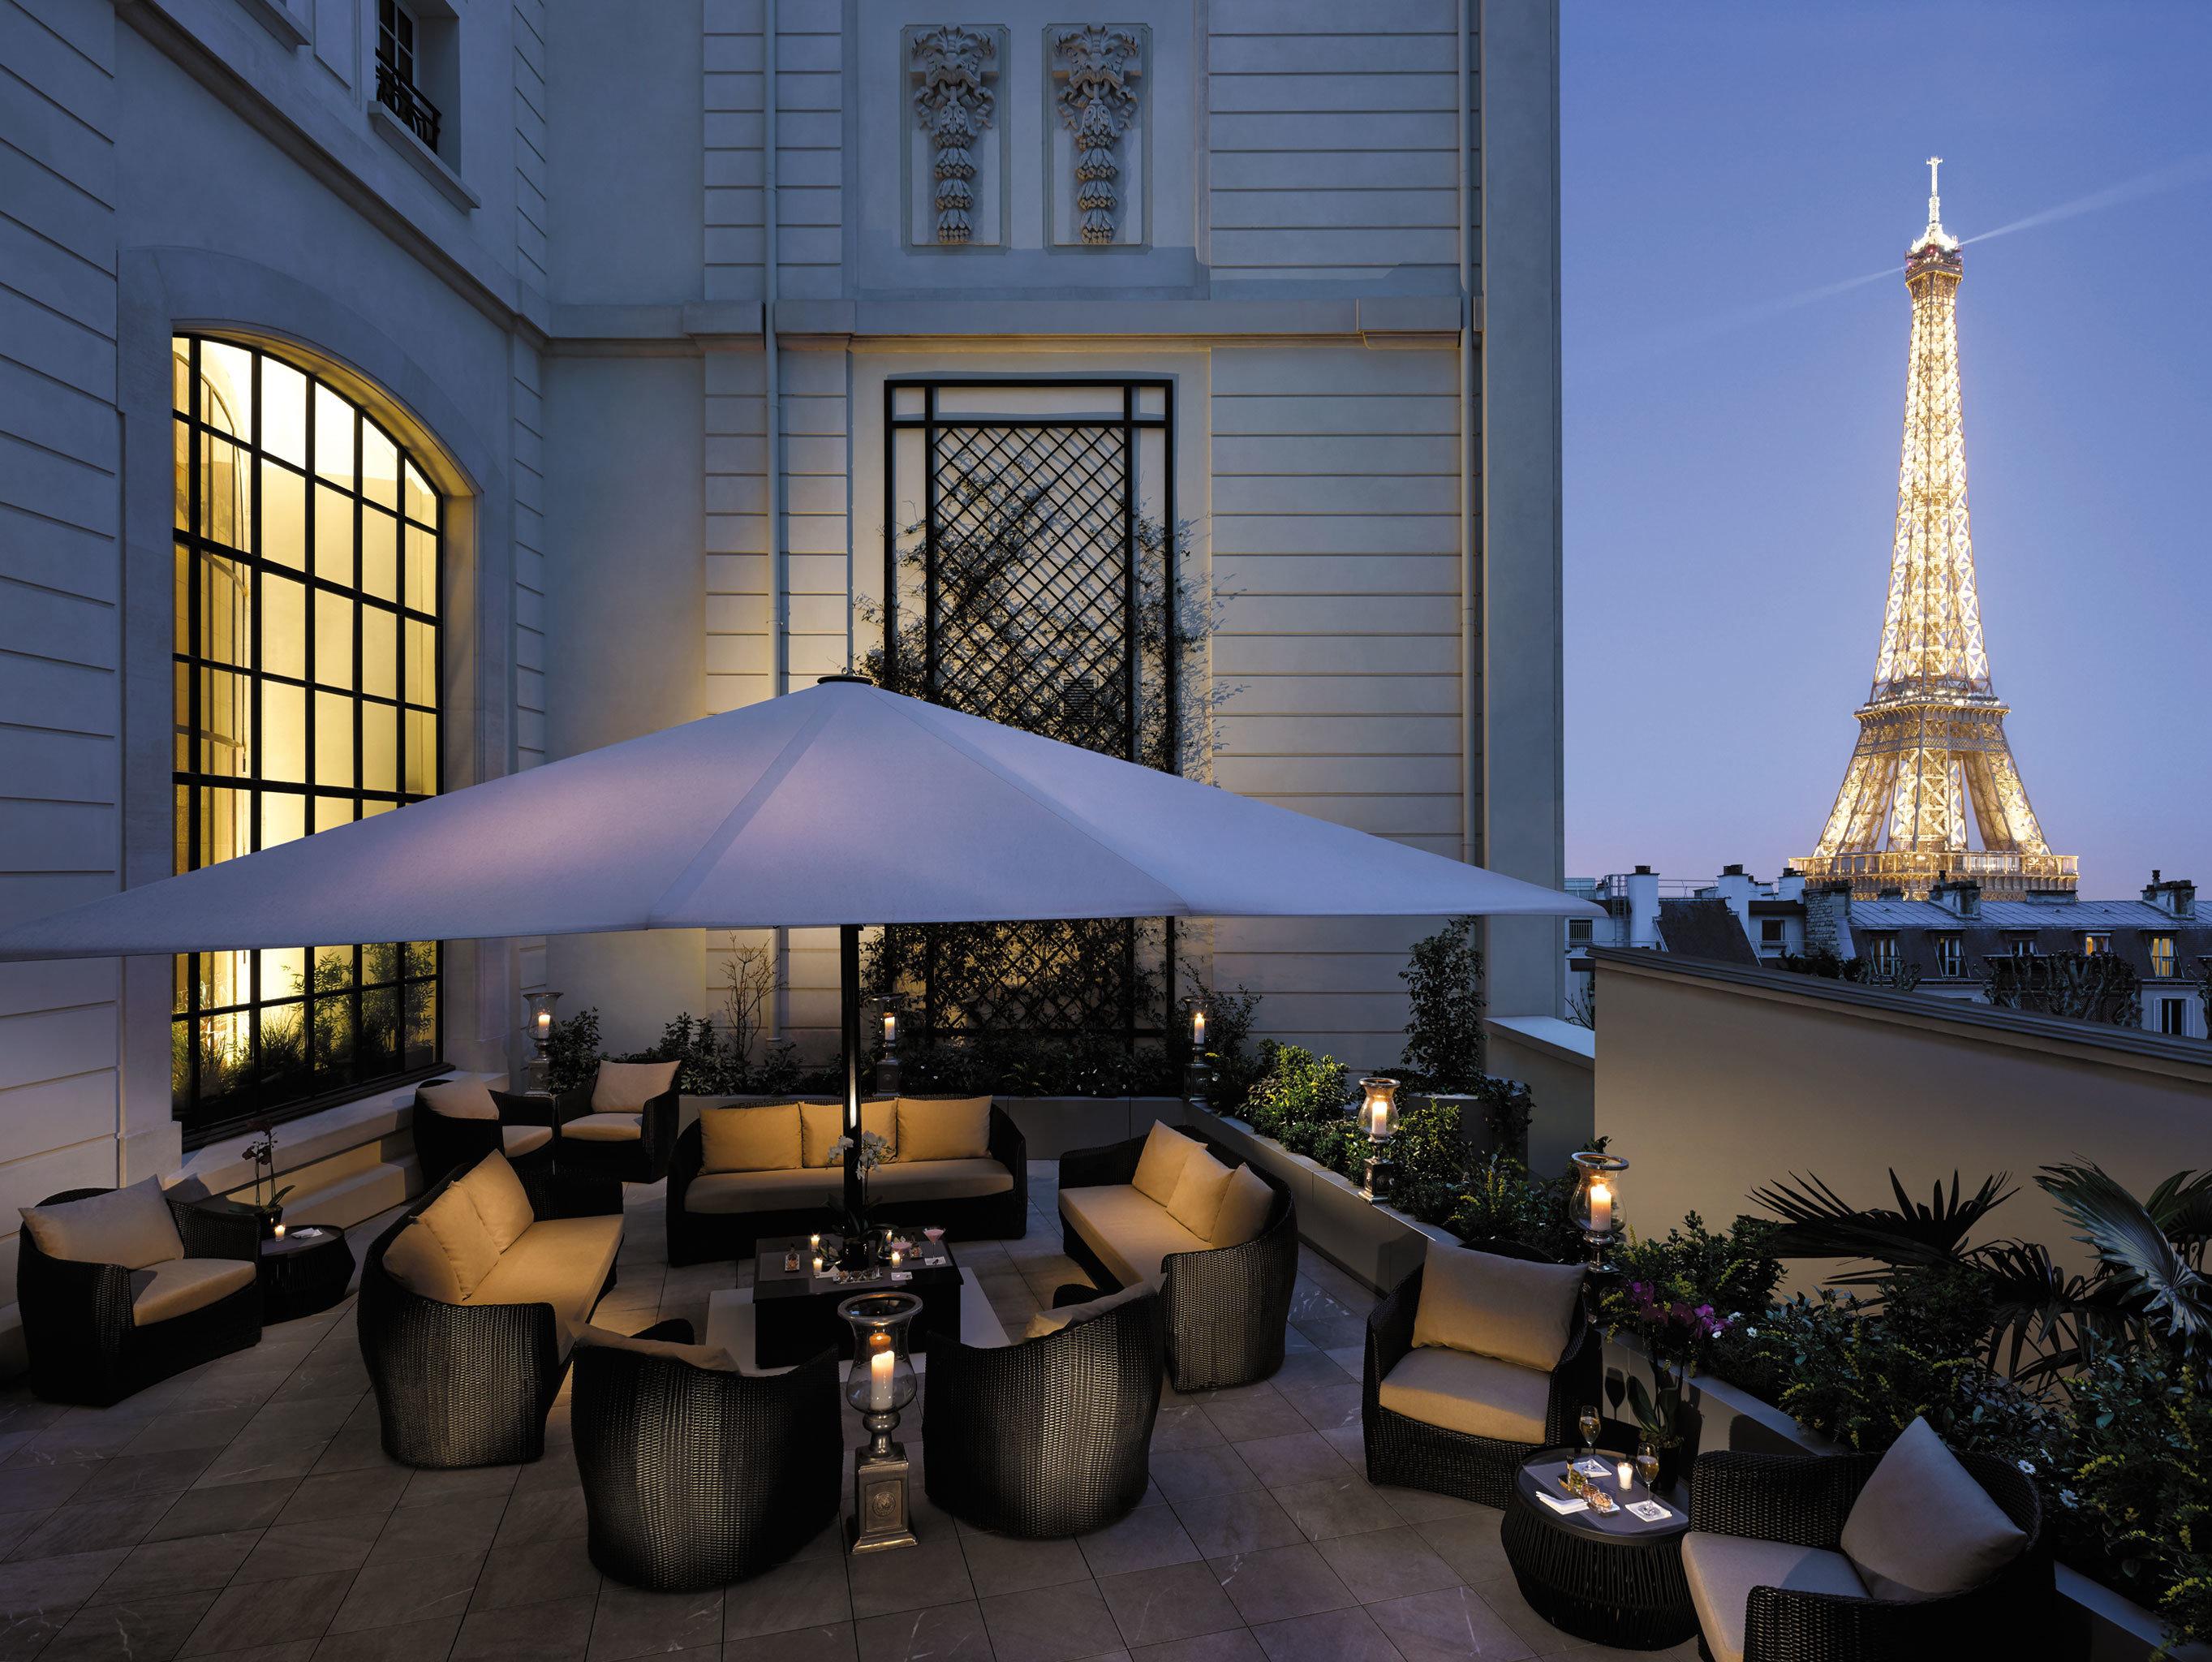 Elegant Exterior Hotels Lounge Luxury Nightlife Patio Romance Scenic views building window room lighting estate interior design furniture decorated